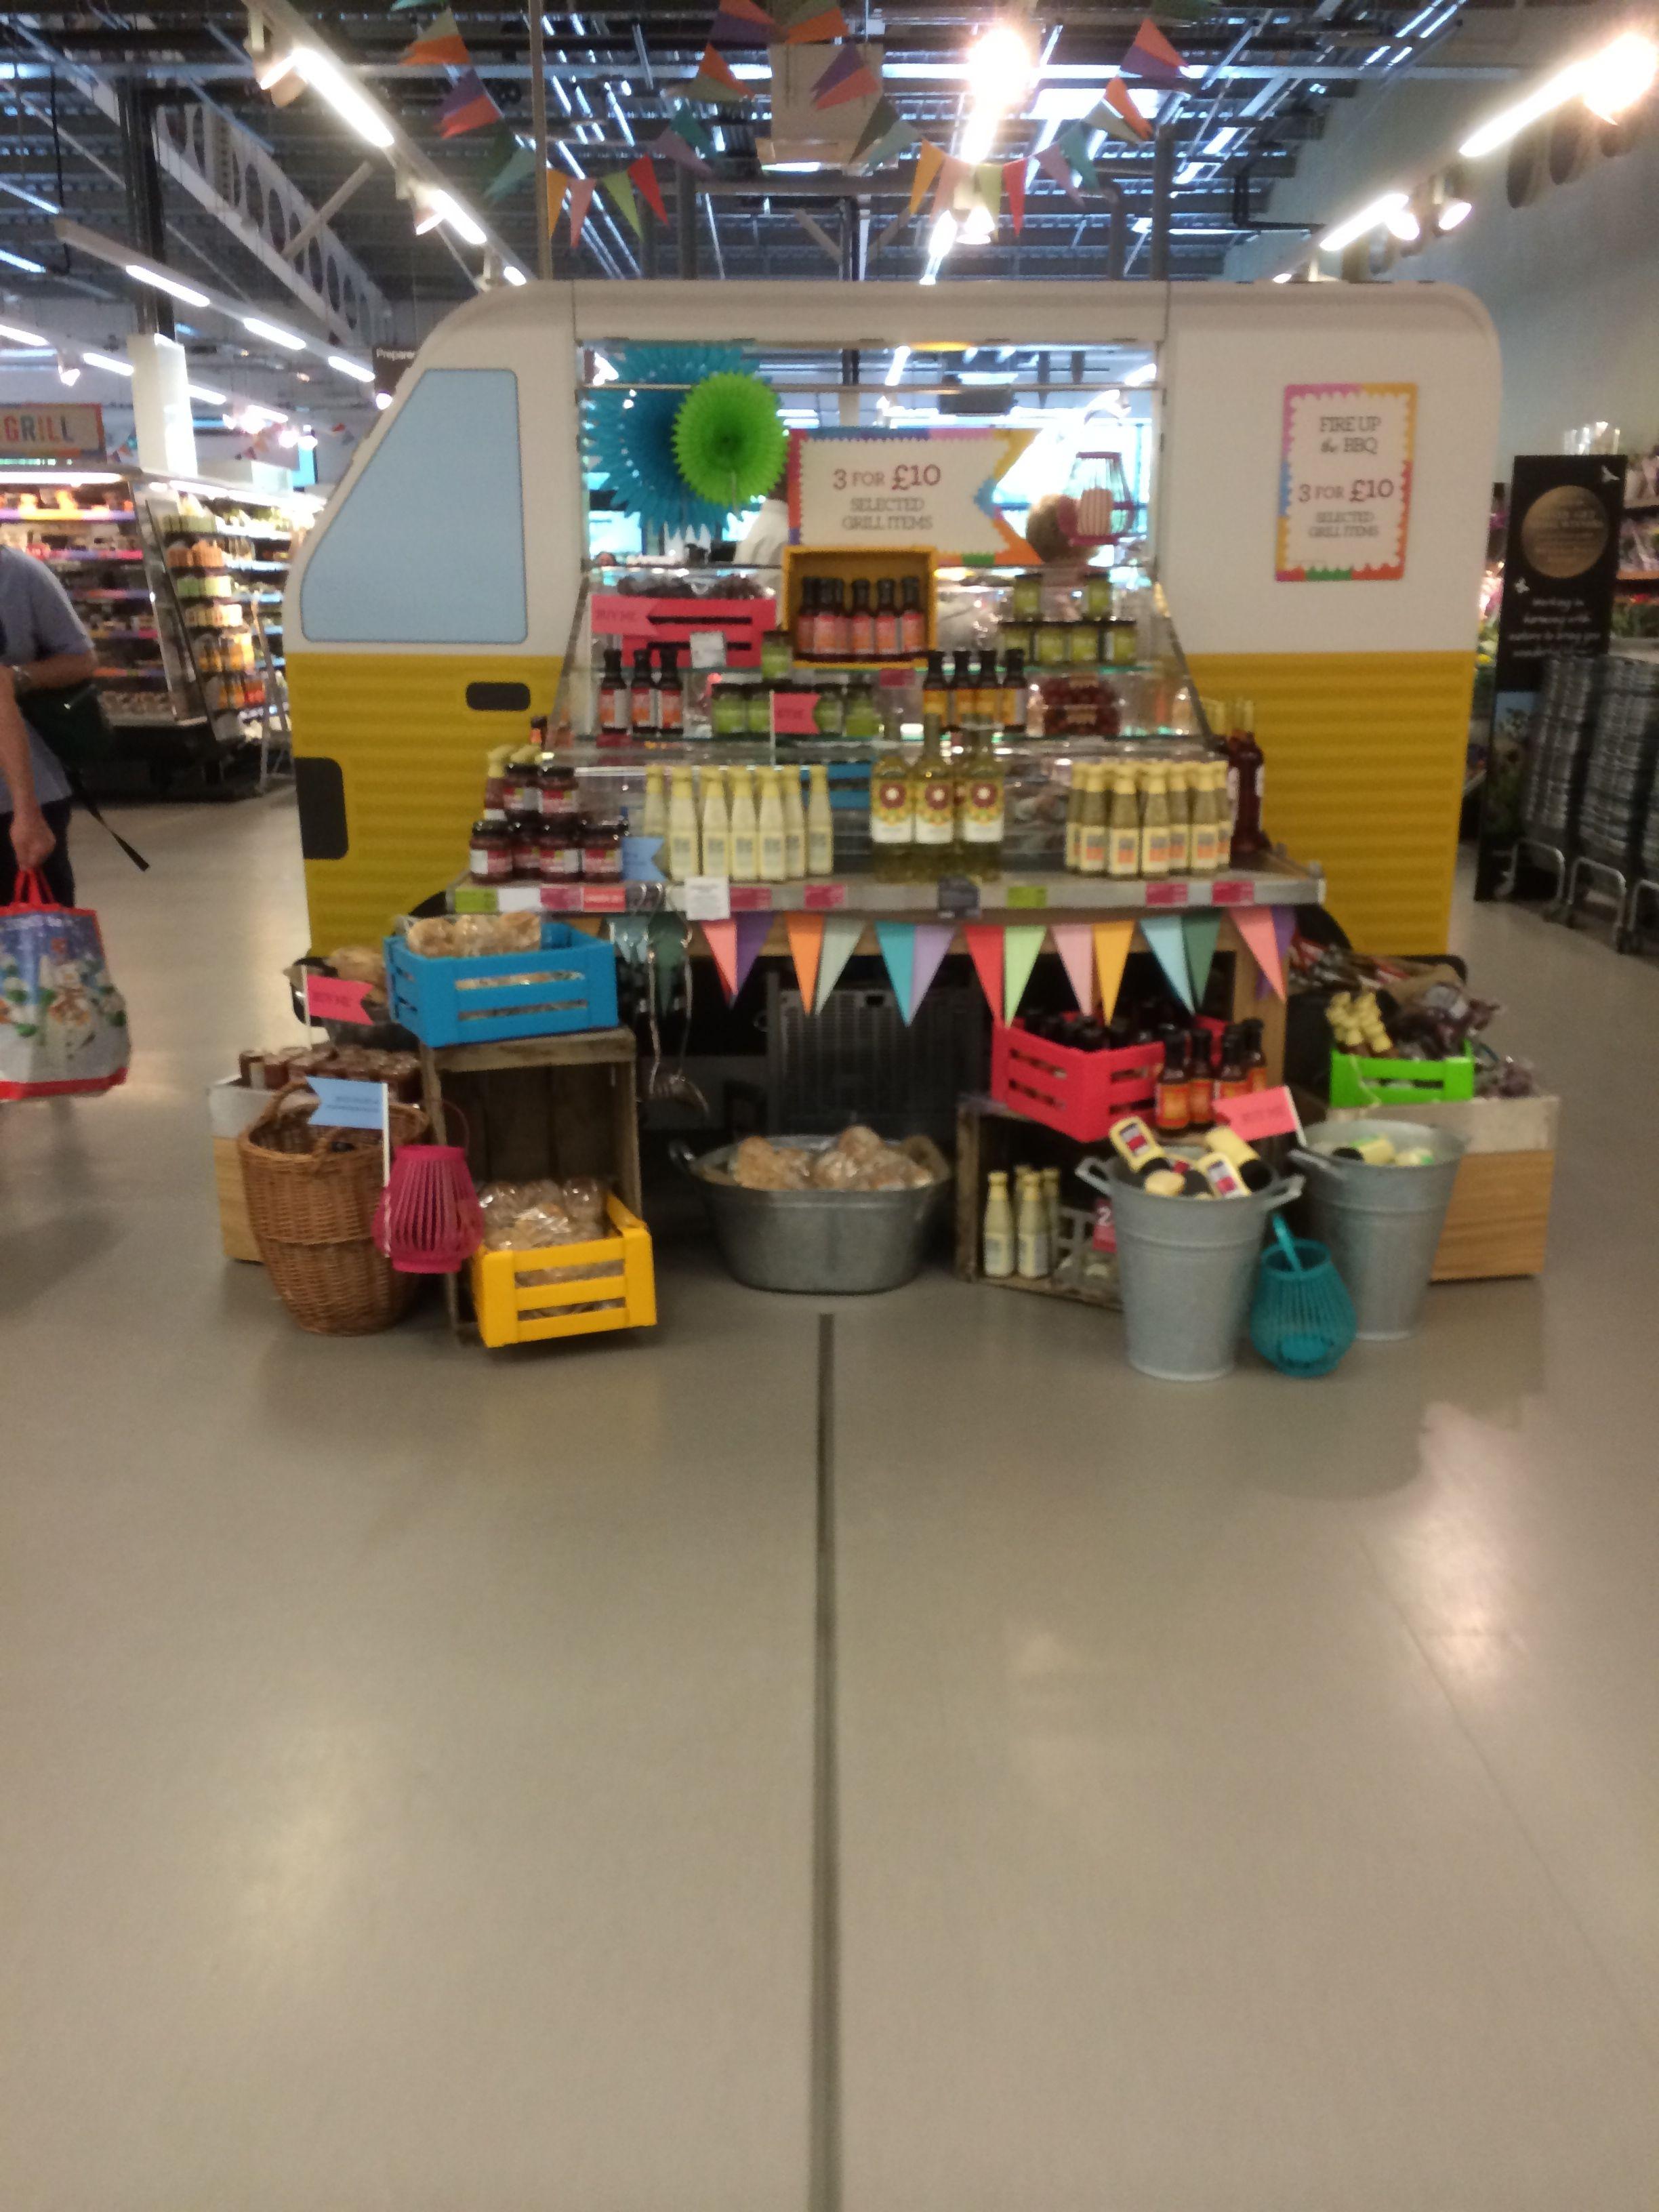 & - Shoreham Foodhall Food Supermarket Layout